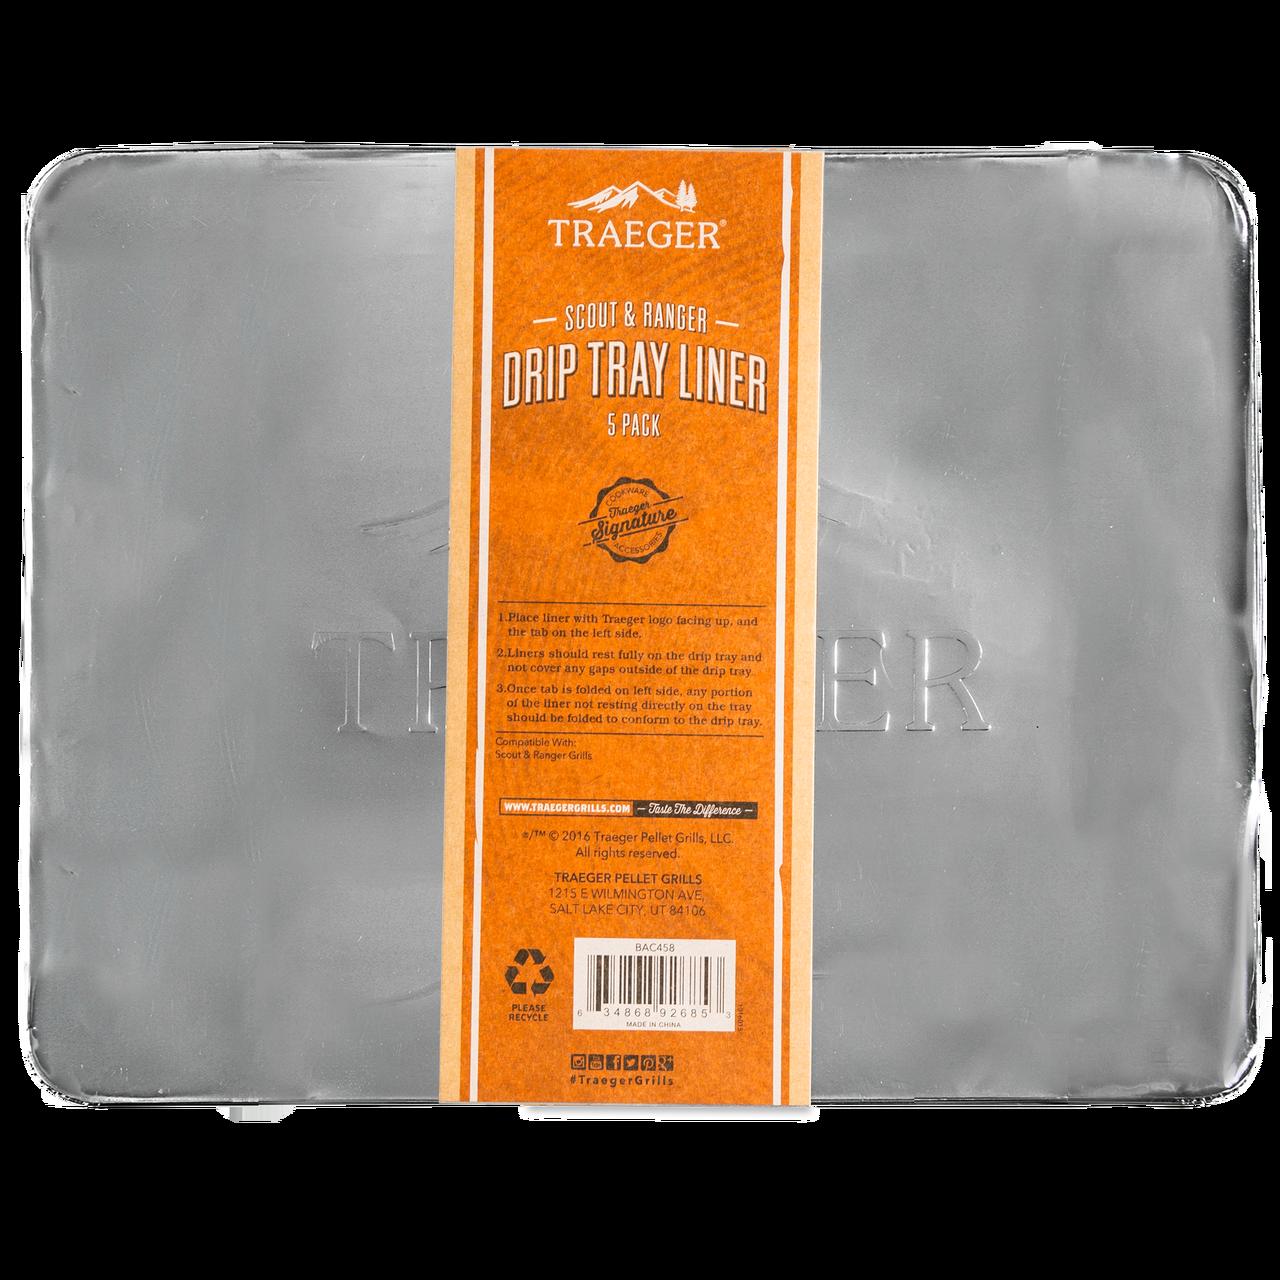 TRAEGER PELLET GRILLS BAC458 RANGER/SCOUT DRIP PANS 5 PACK